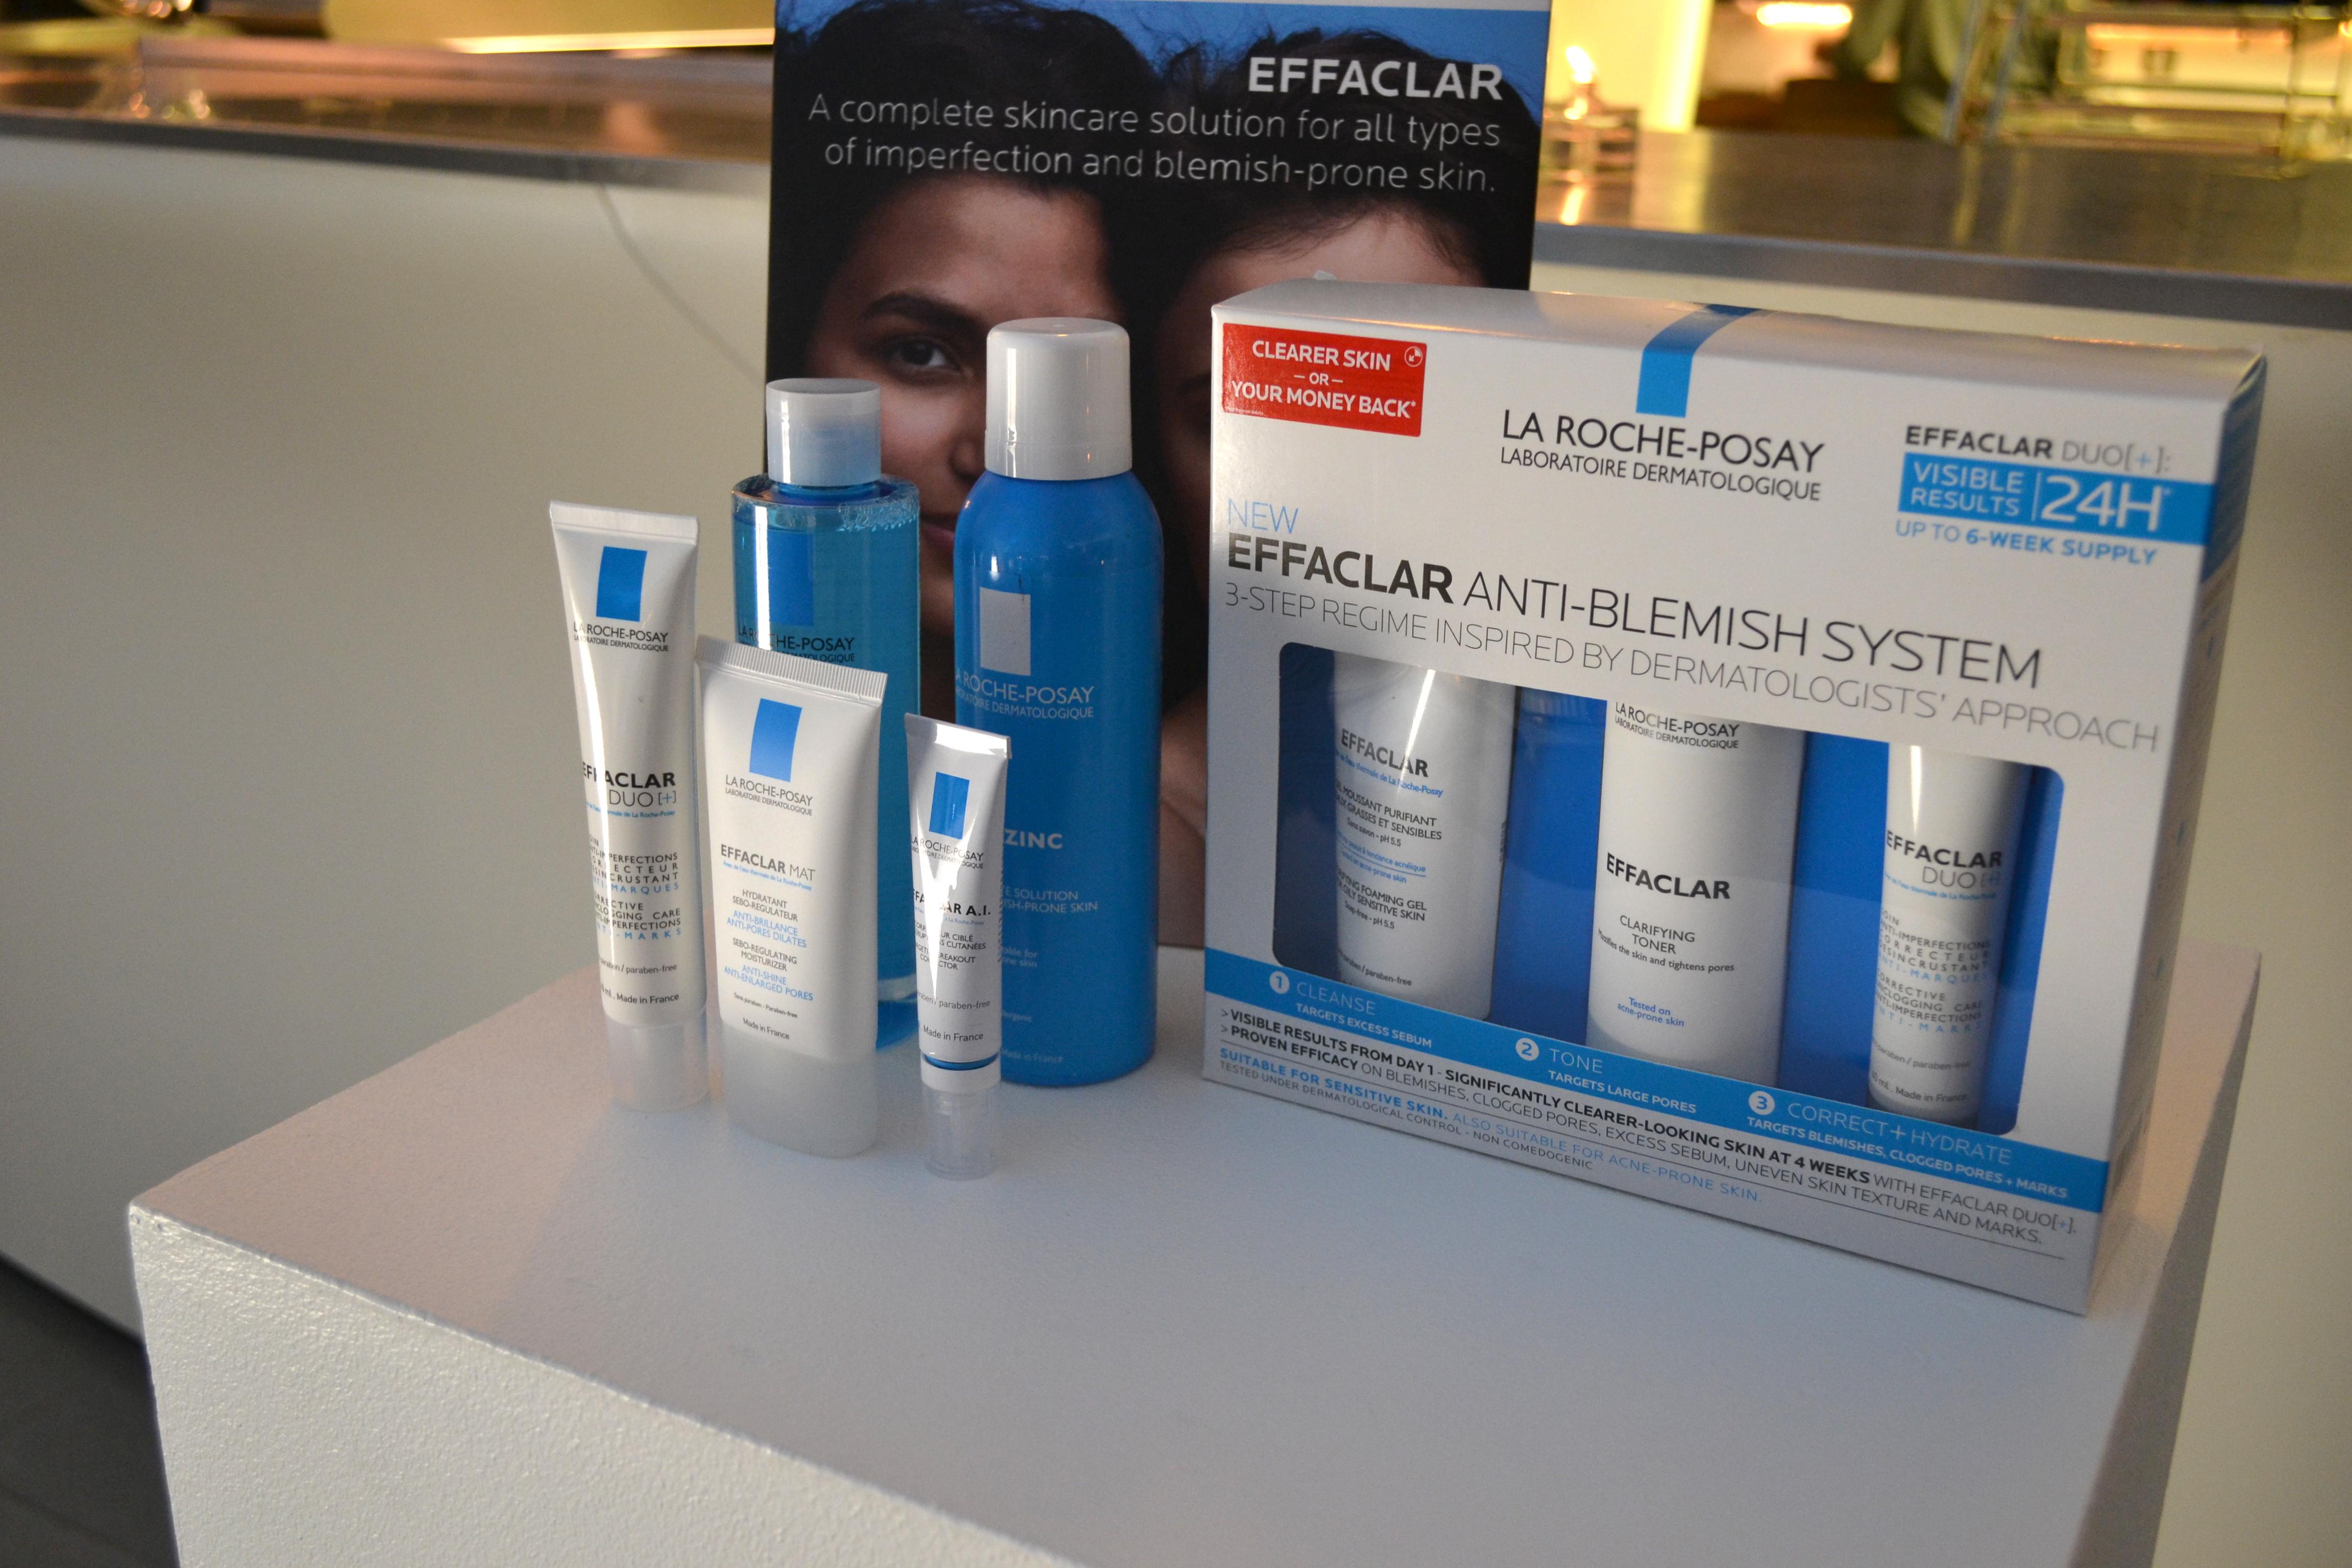 La Roche-Posay Effaclar Gift set